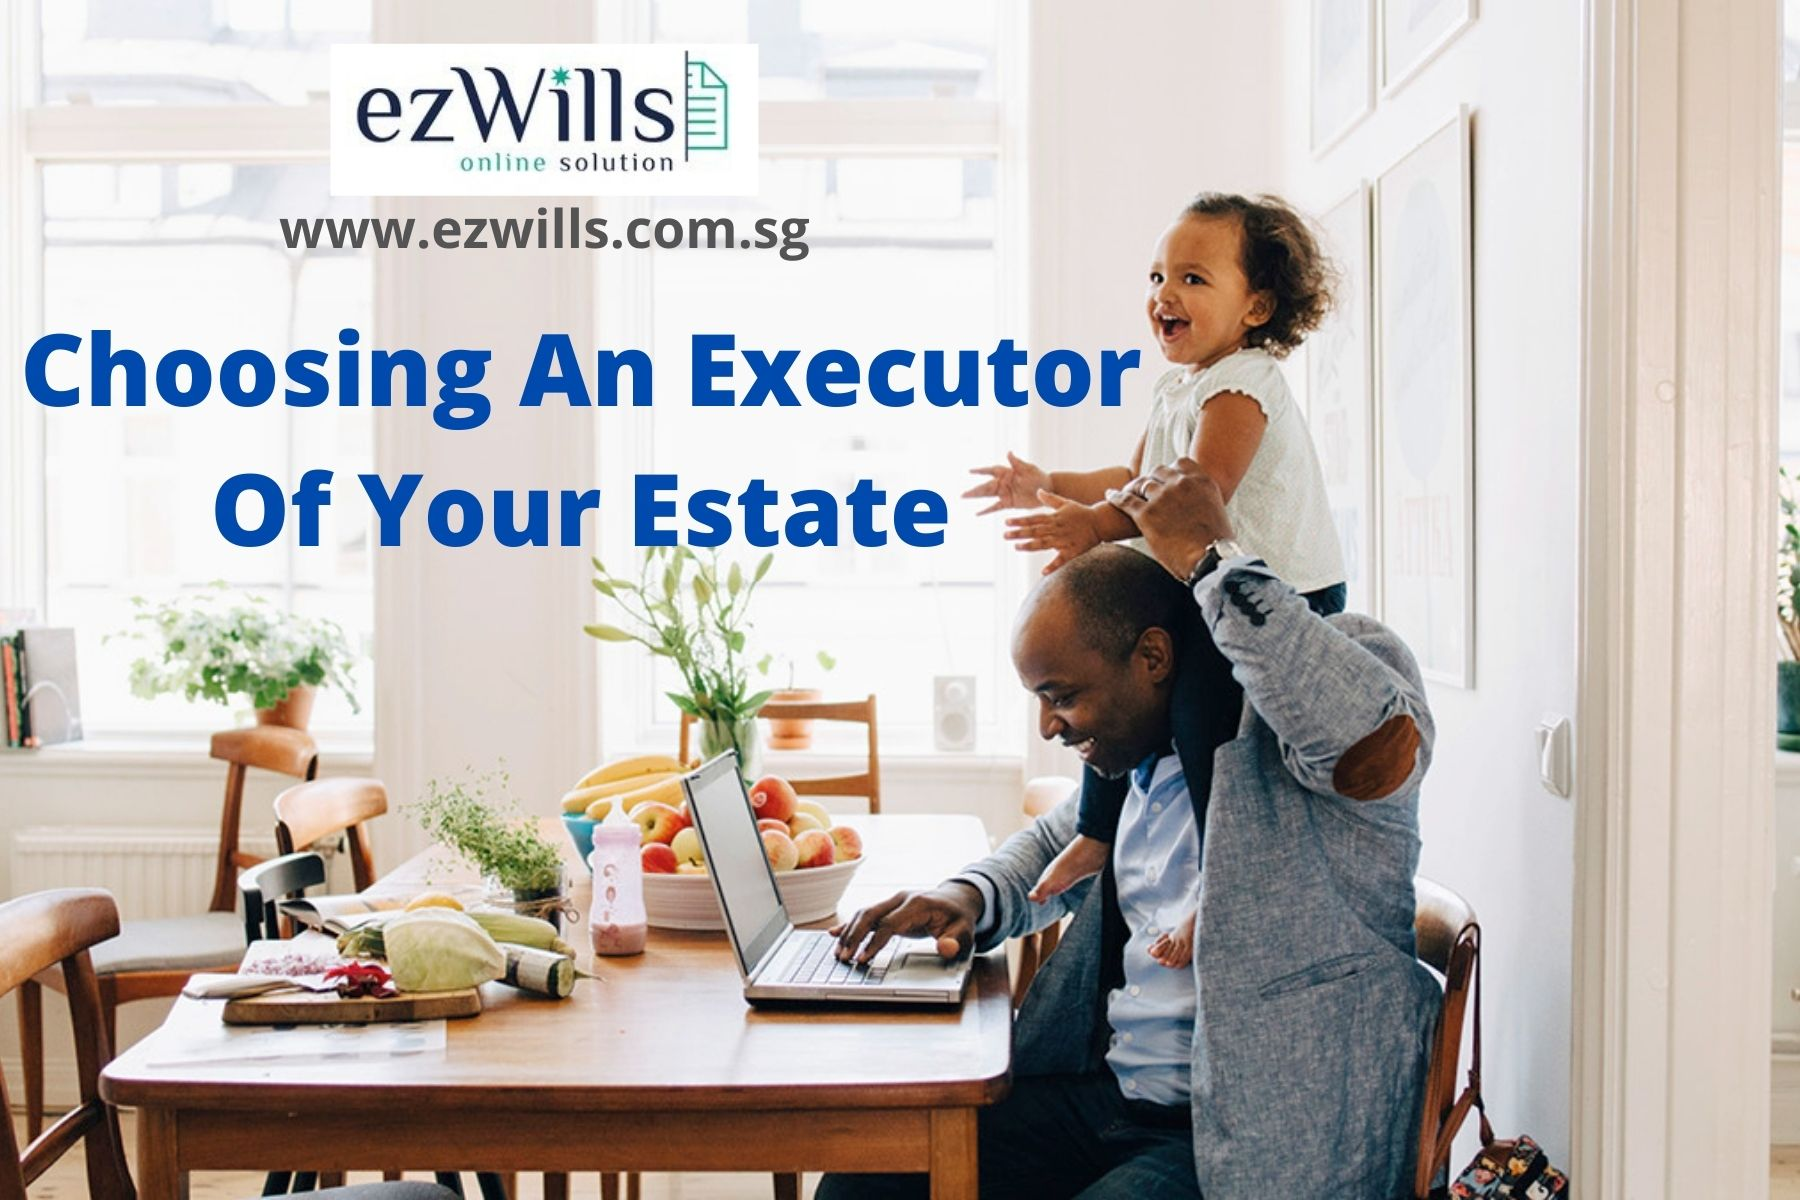 Choosing an executor of your estate